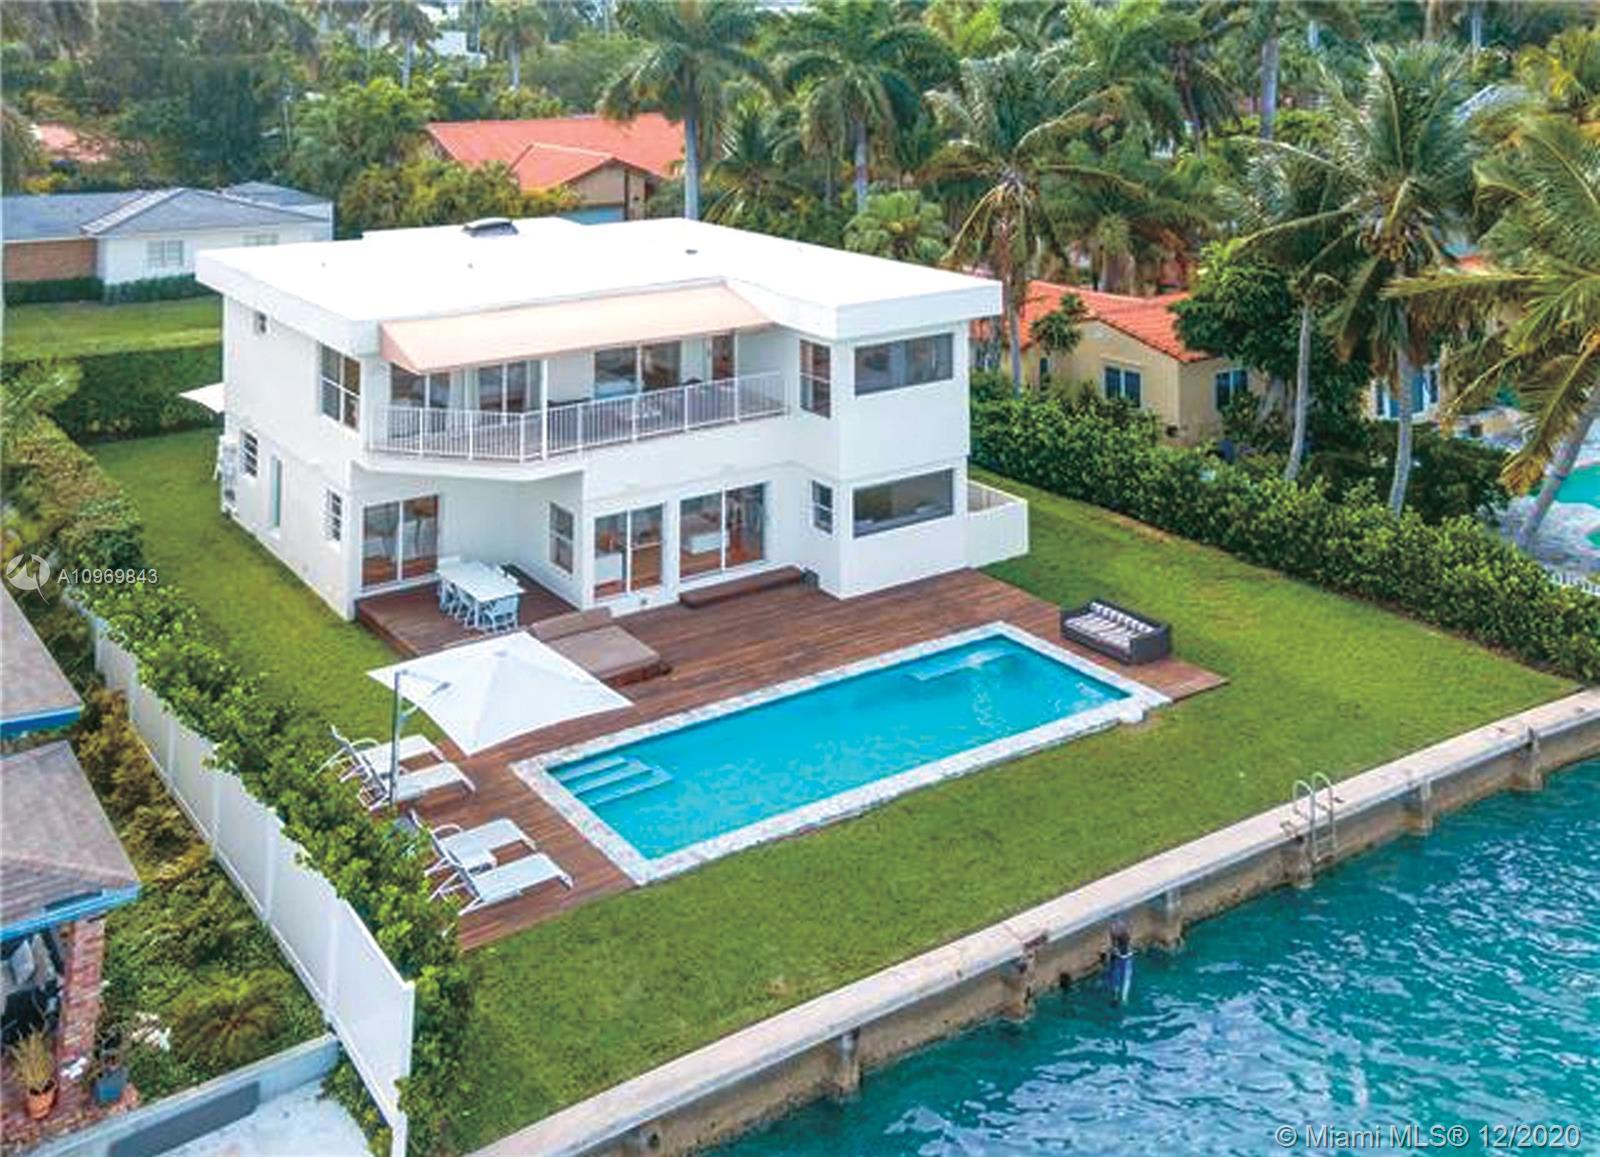 7711 Beachview Dr, North Bay Village, Florida 33141